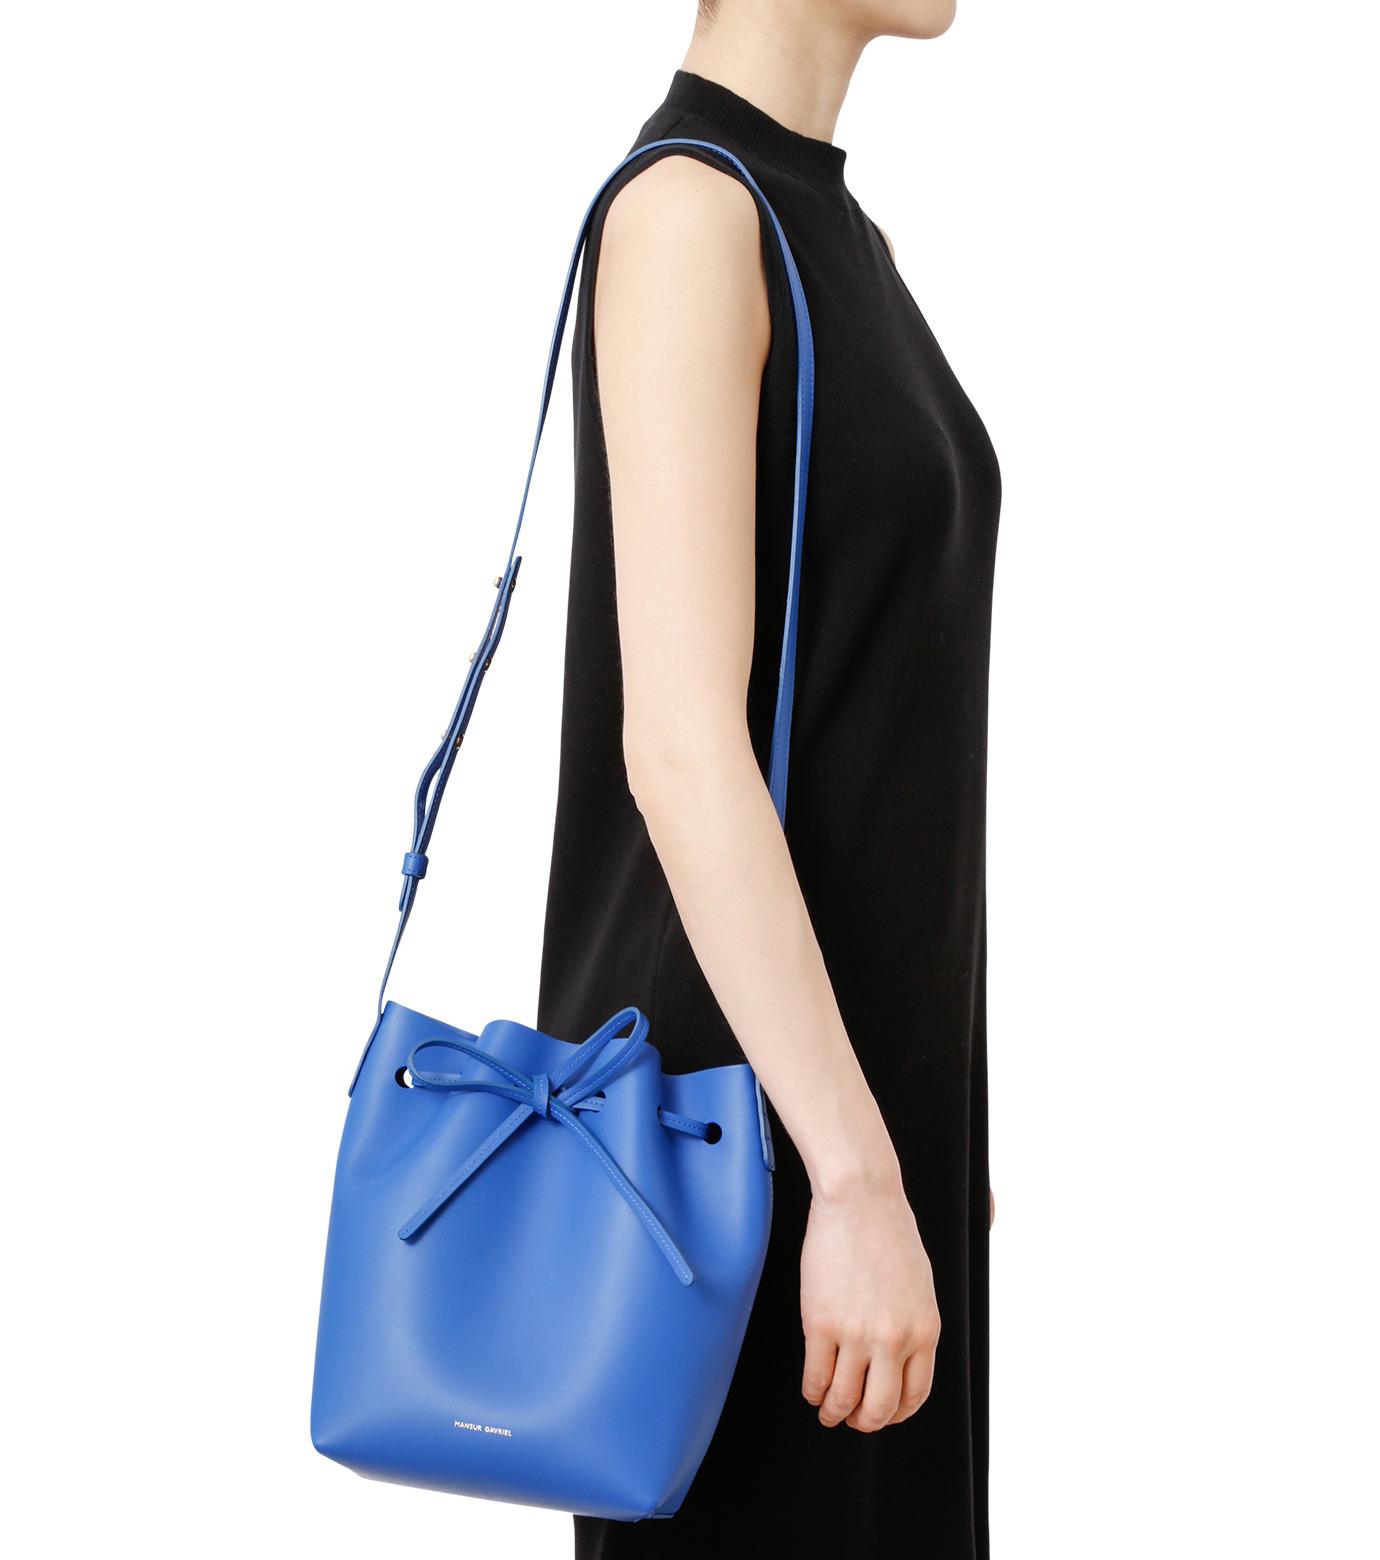 Mansur Gavriel(マンサーガブリエル)のMini Bucket Bag-BLUE(バッグ/bag)-HMB004CA-92 拡大詳細画像4